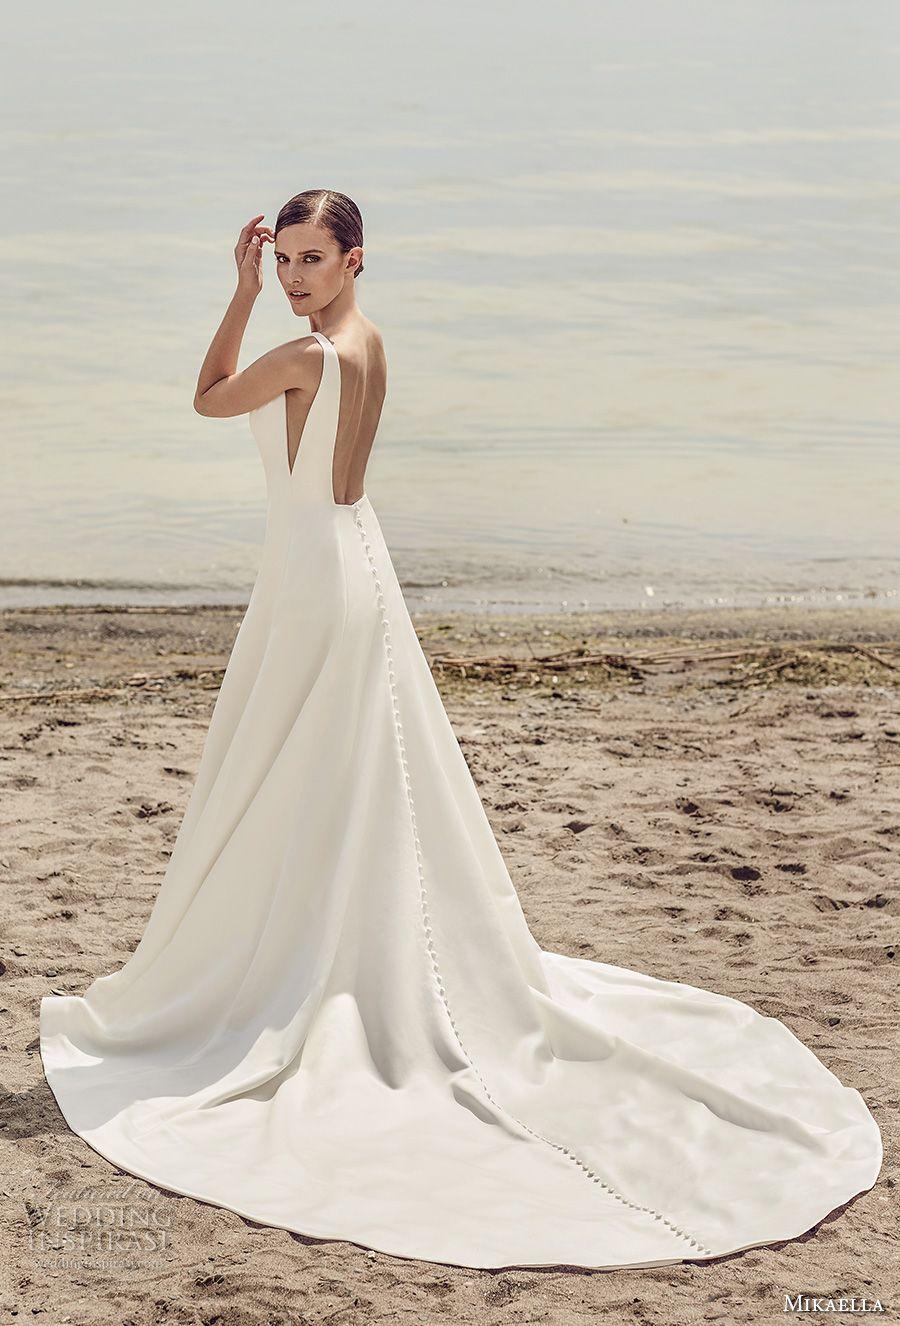 Mikaella bridal spring wedding dresses gowns pinterest